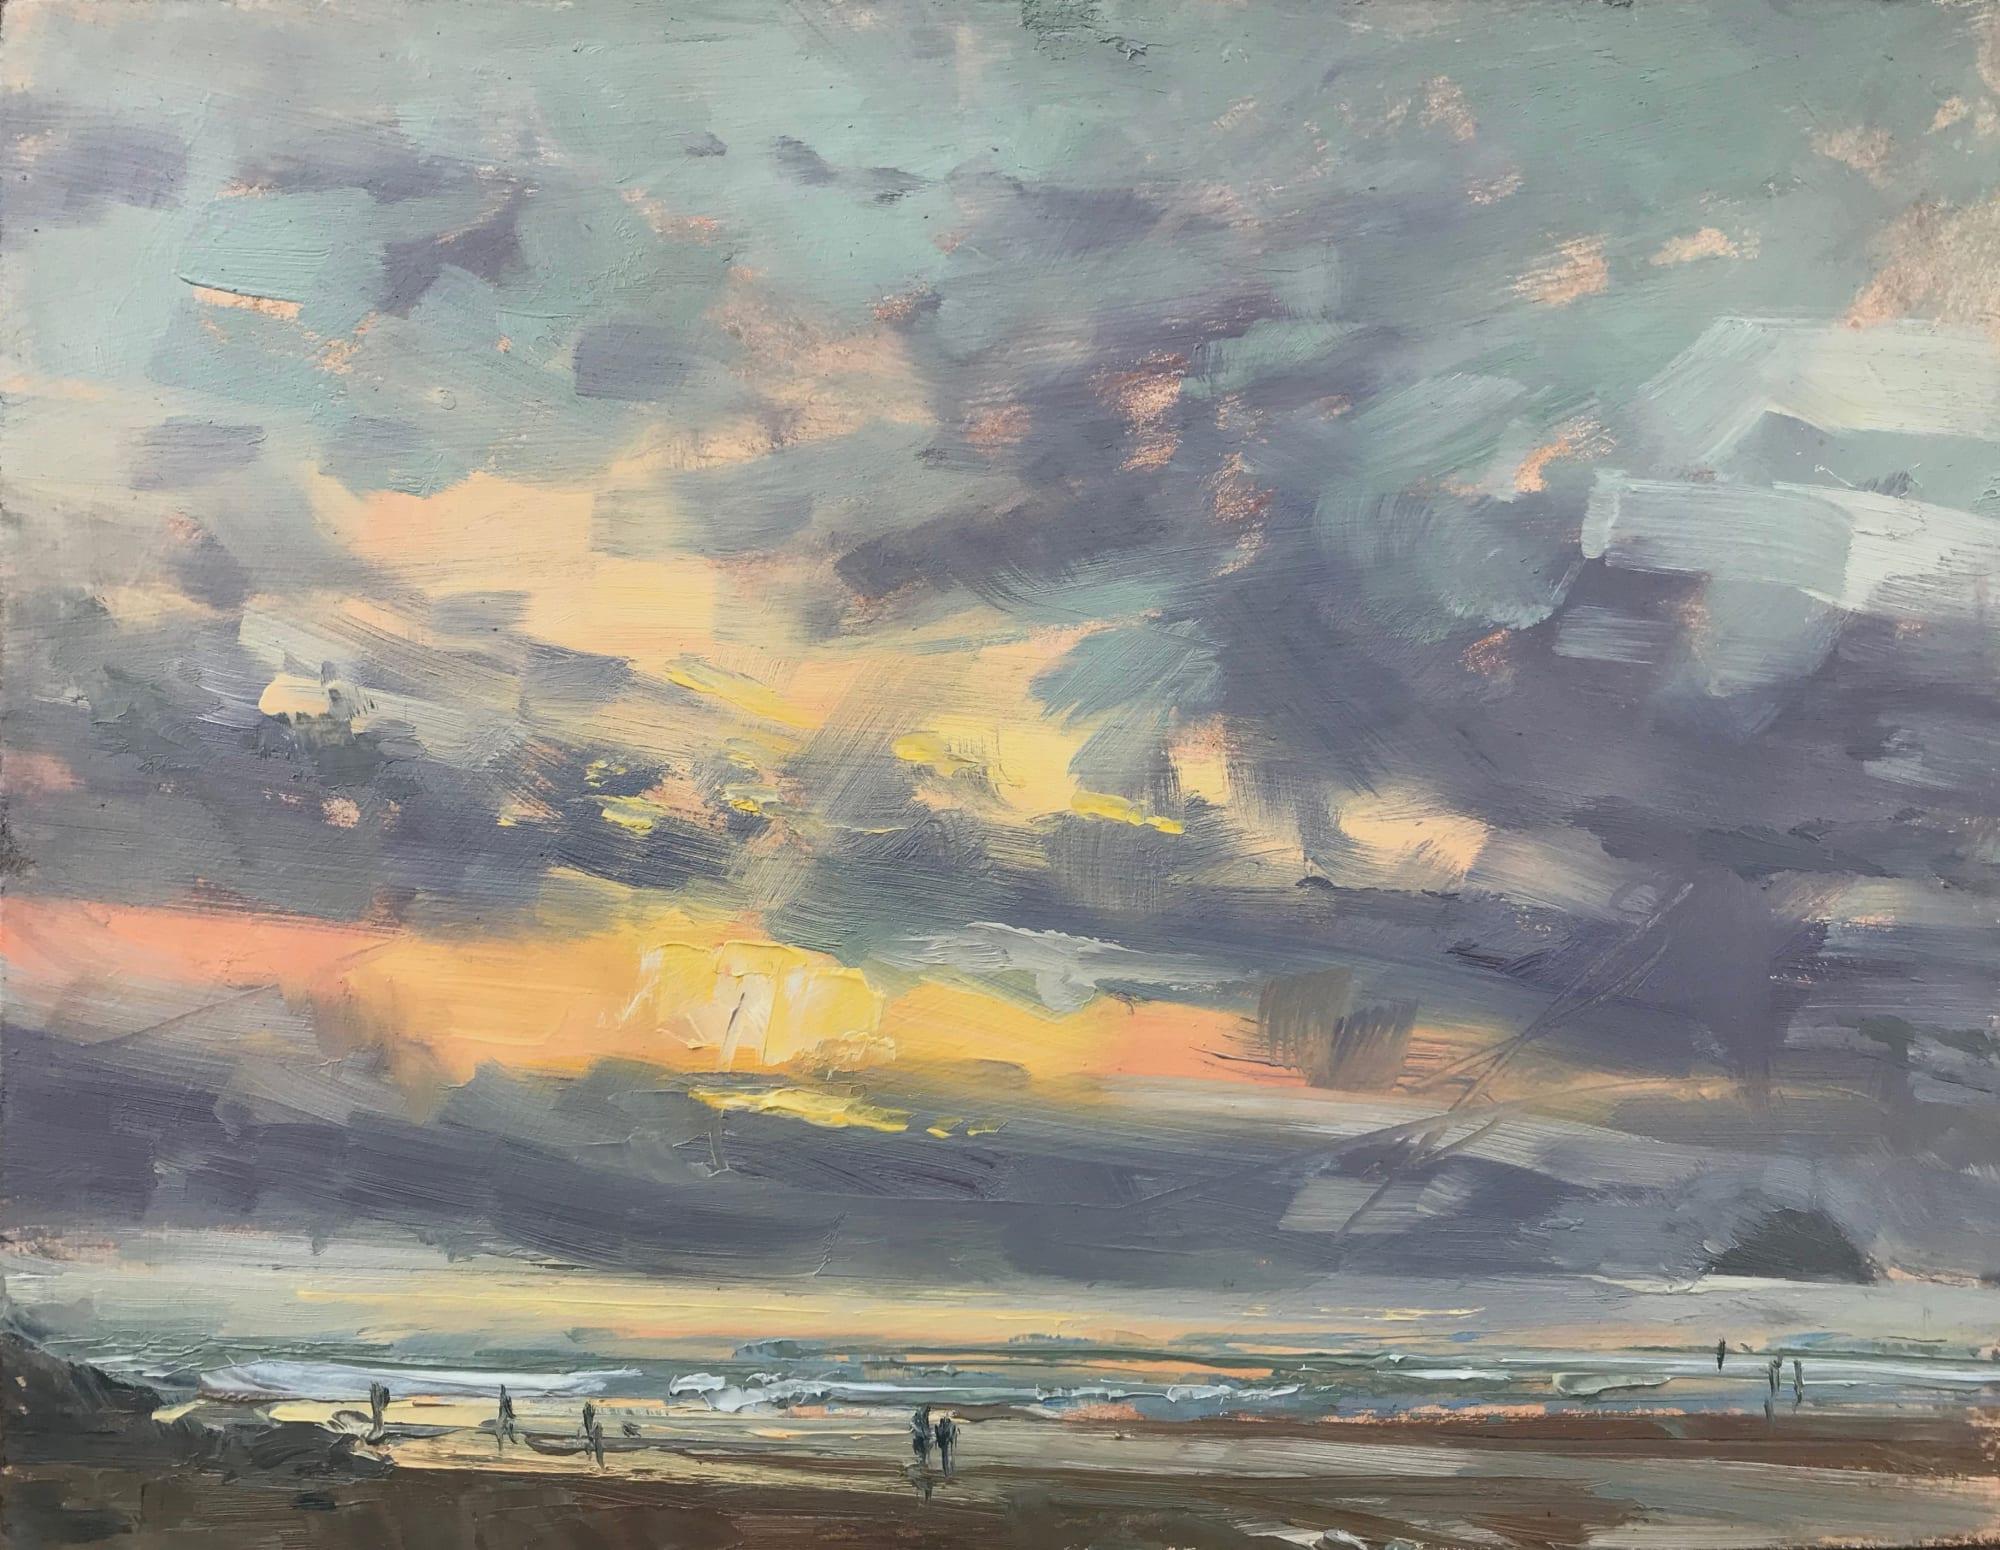 Georgina Potter: Stormy Skies, Polzeath